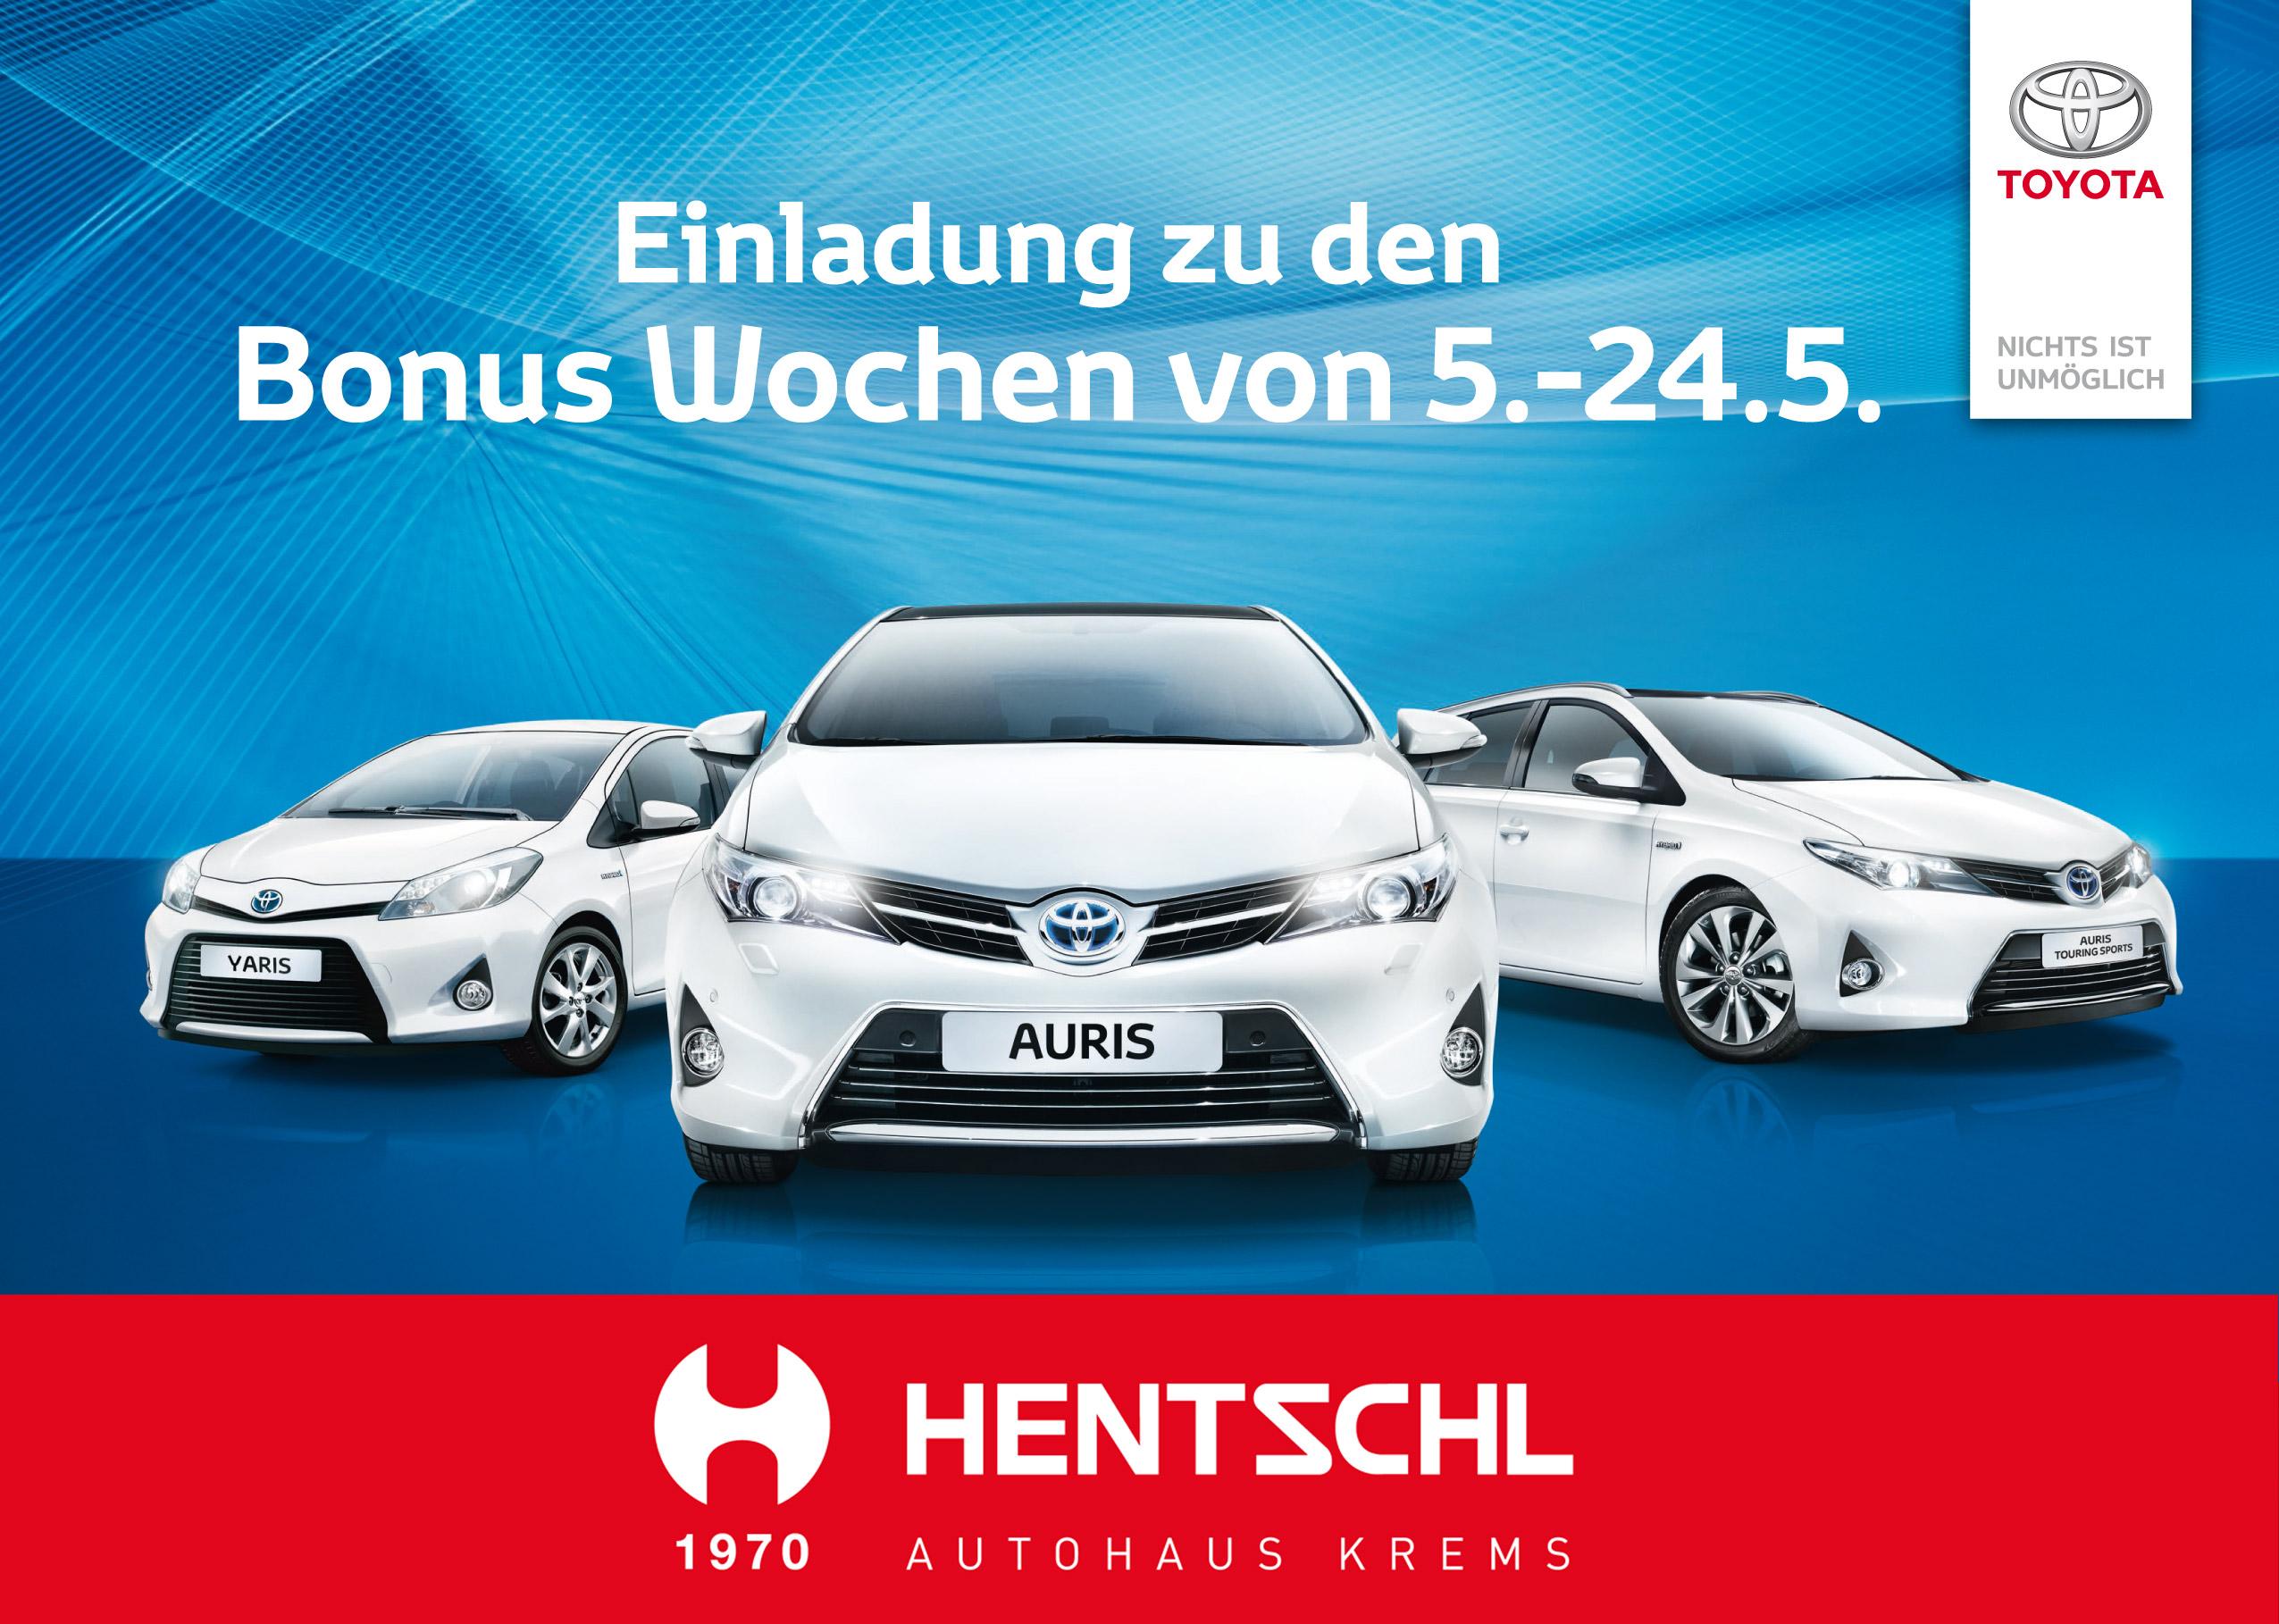 Hentschl Ges.m.b.H. & Co KG